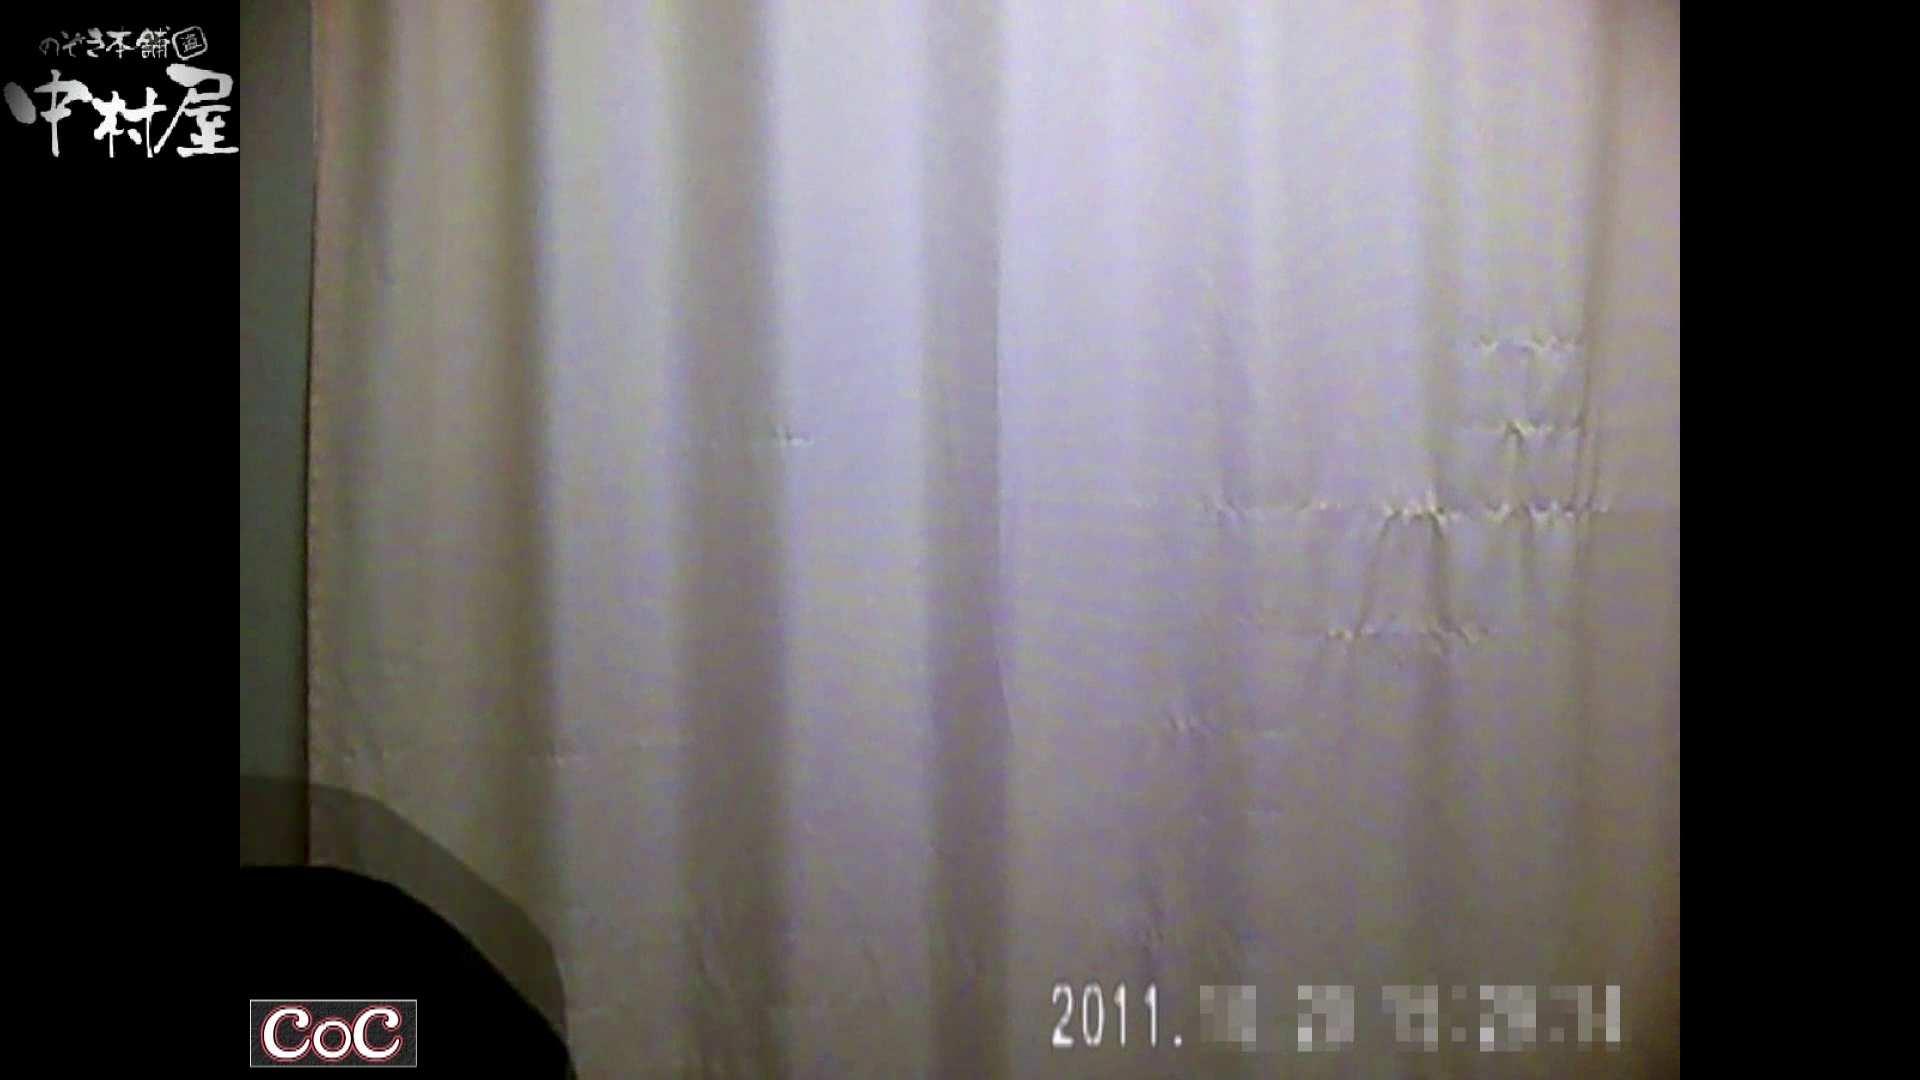 Doctor-X元医者による反抗vol.65 OLエロ画像  106PICs 22